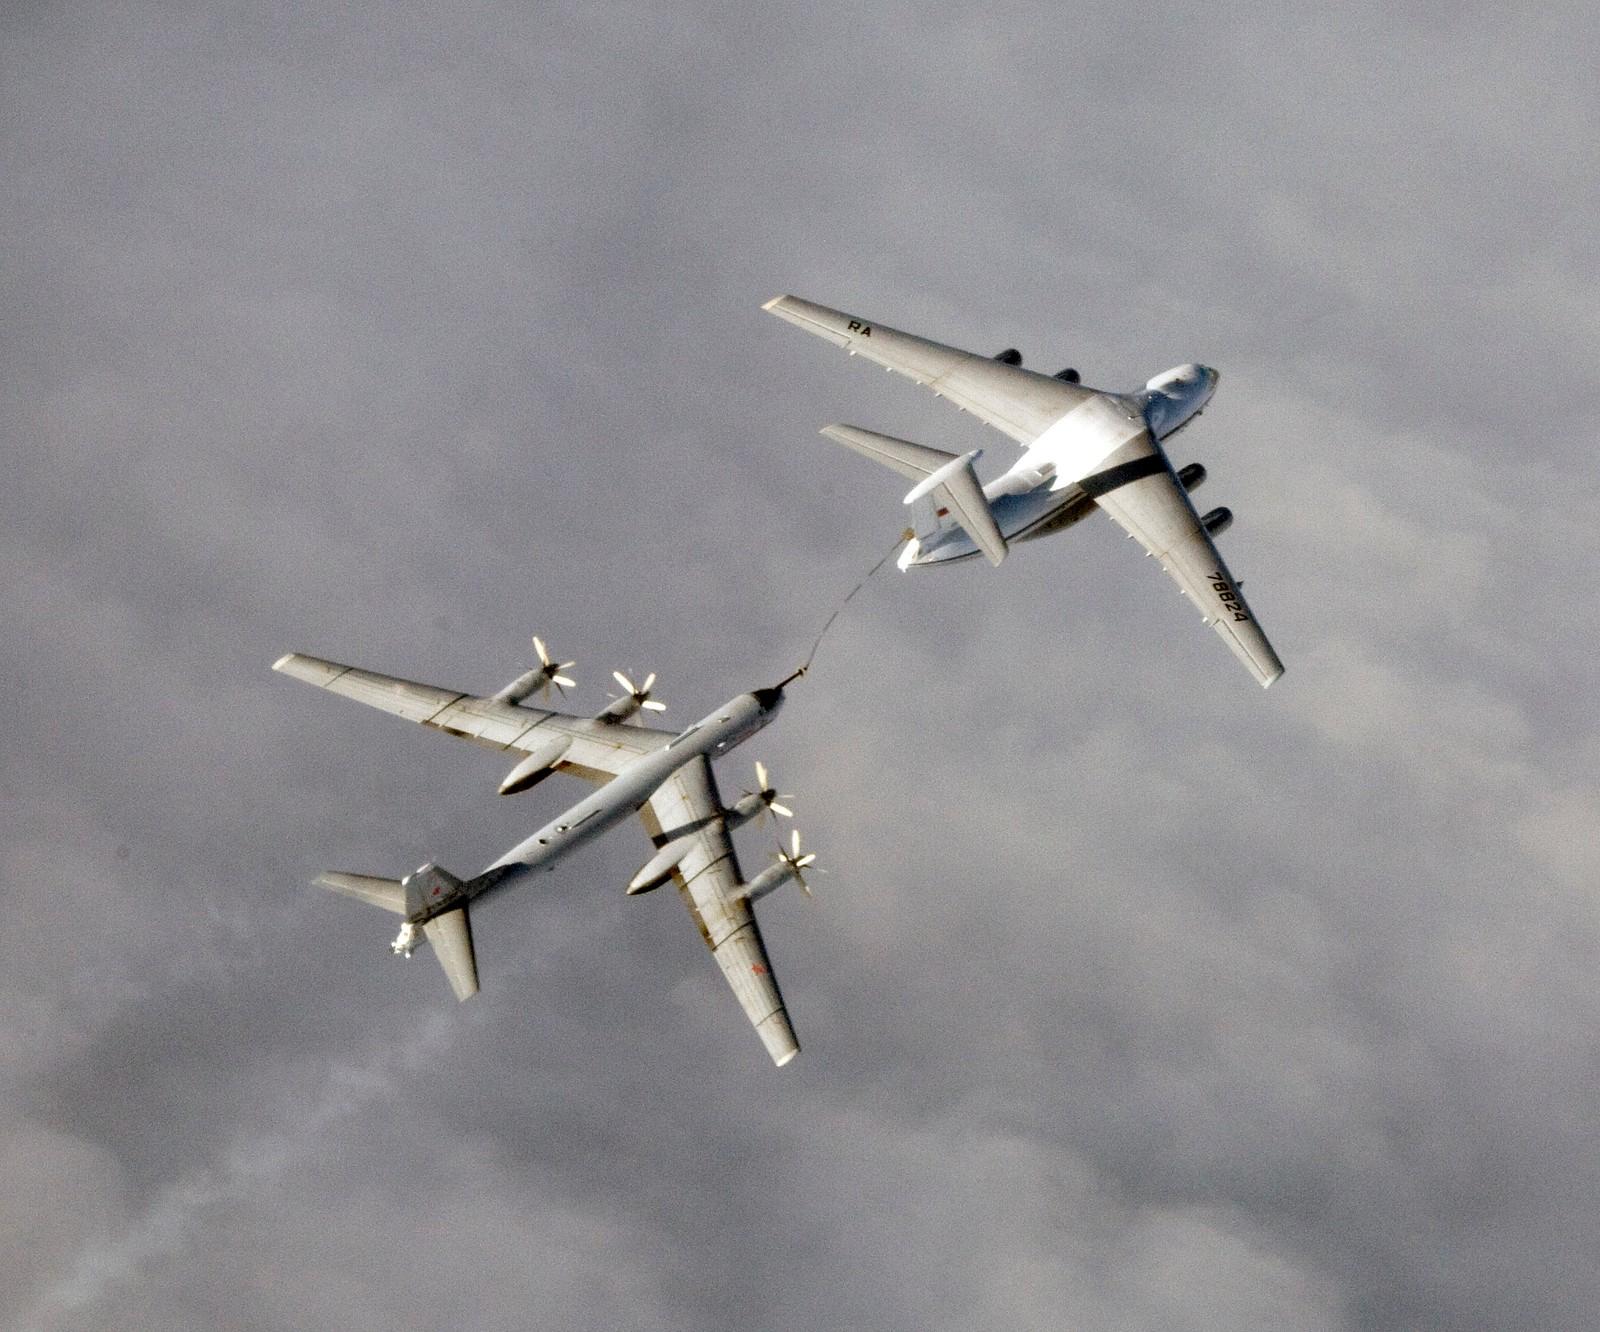 Ilyushin Il-78 (NATO-kallenavn Midas) og Tupolev Tu 95MS (NATO-kallenavn: Bear).